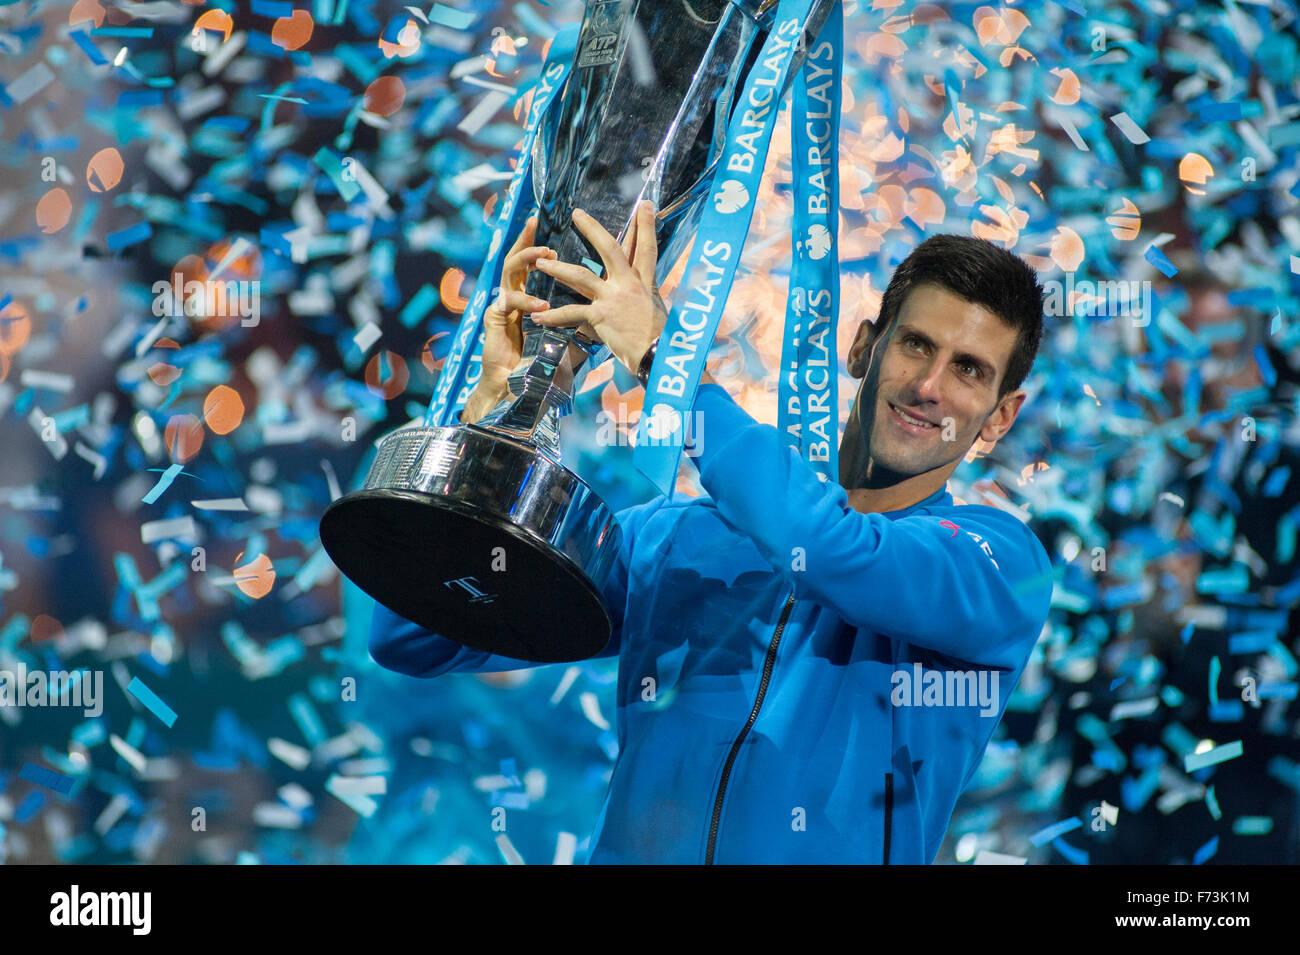 Barclays ATP World Tour Finals 2015. Novak Djokovic defeats Roger Federer to take the Winners' Trophy. - Stock Image